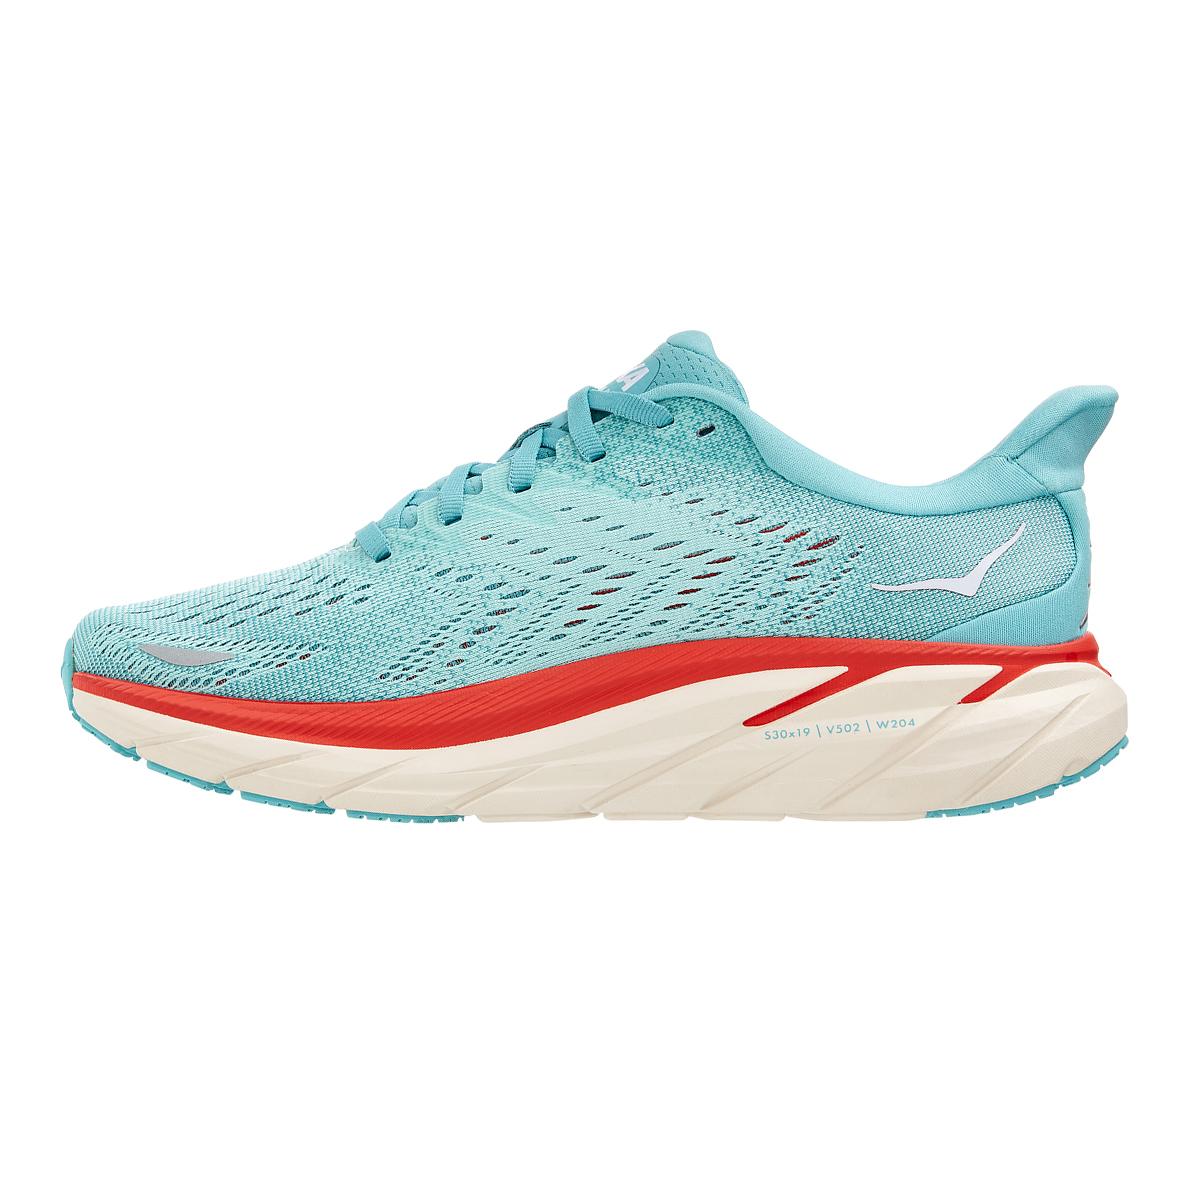 Women's Hoka One One Clifton 8 Running Shoe - Color: Aquarelle / Eggshell Blue - Size: 5 - Width: Regular, Aquarelle / Eggshell Blue, large, image 2